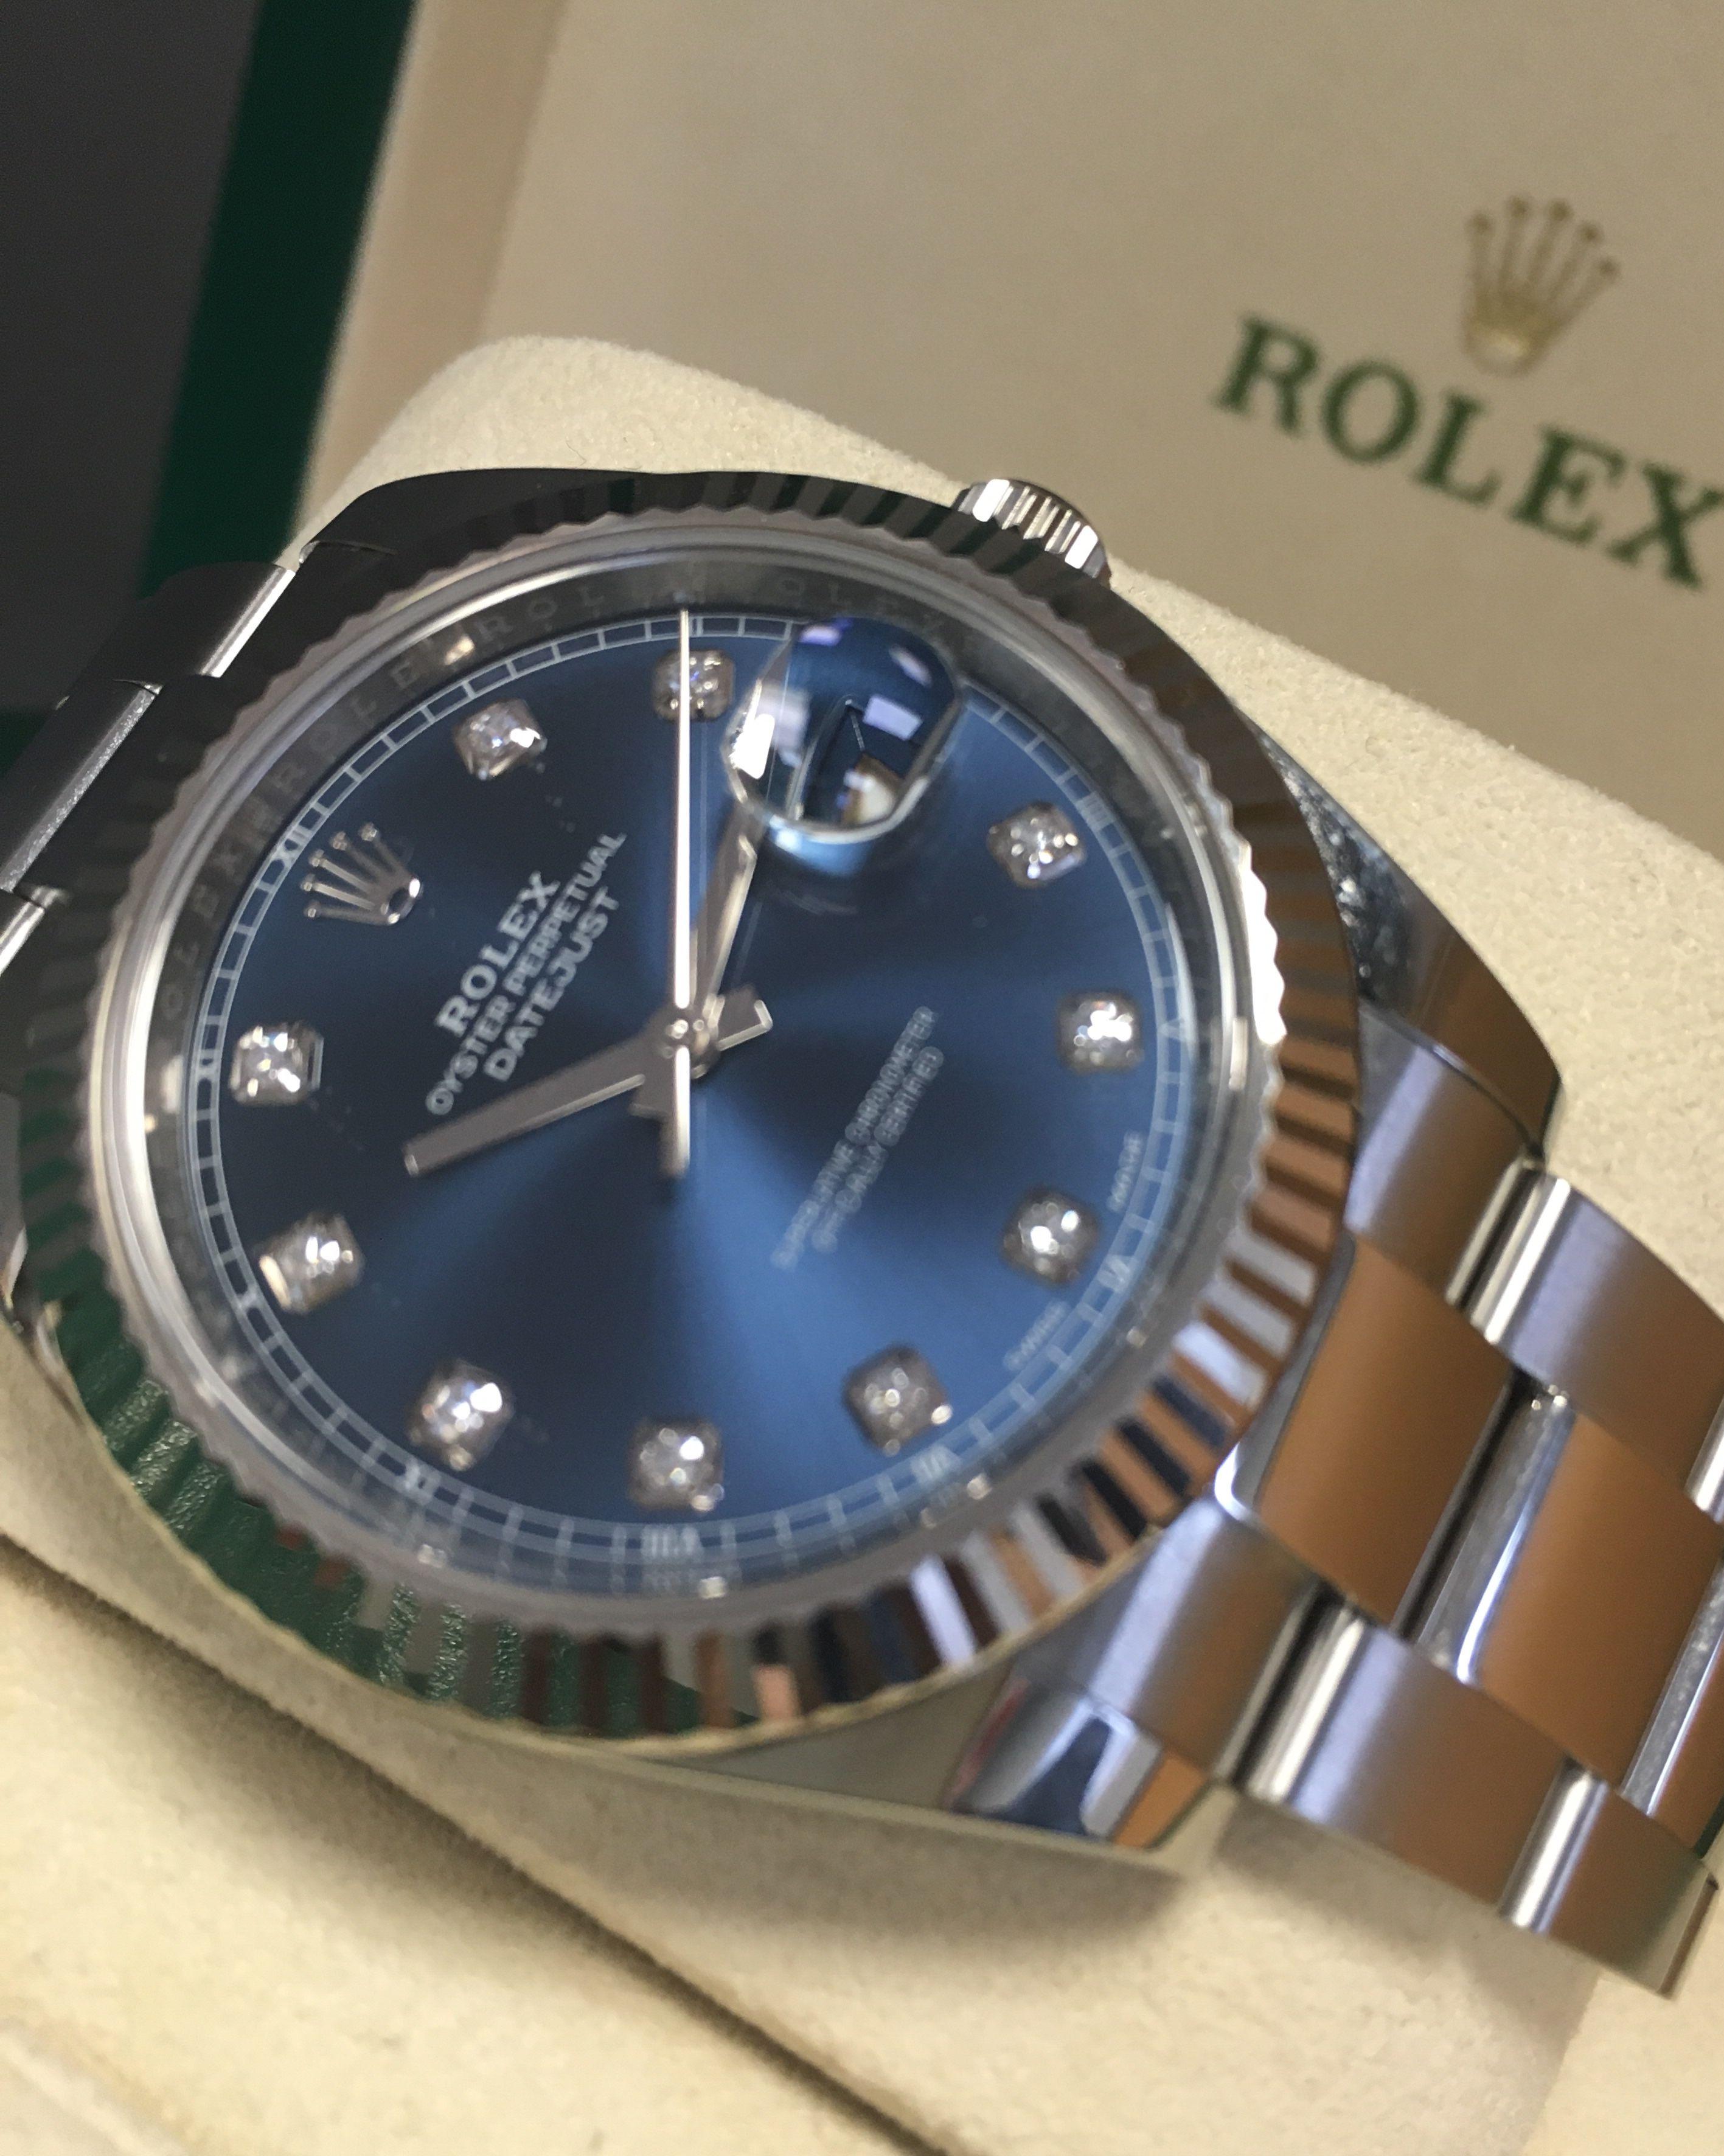 cf7f126113c Rolex Datejust 41 Blue Diamond Dial 126334   dreamwatch   Rolex ...